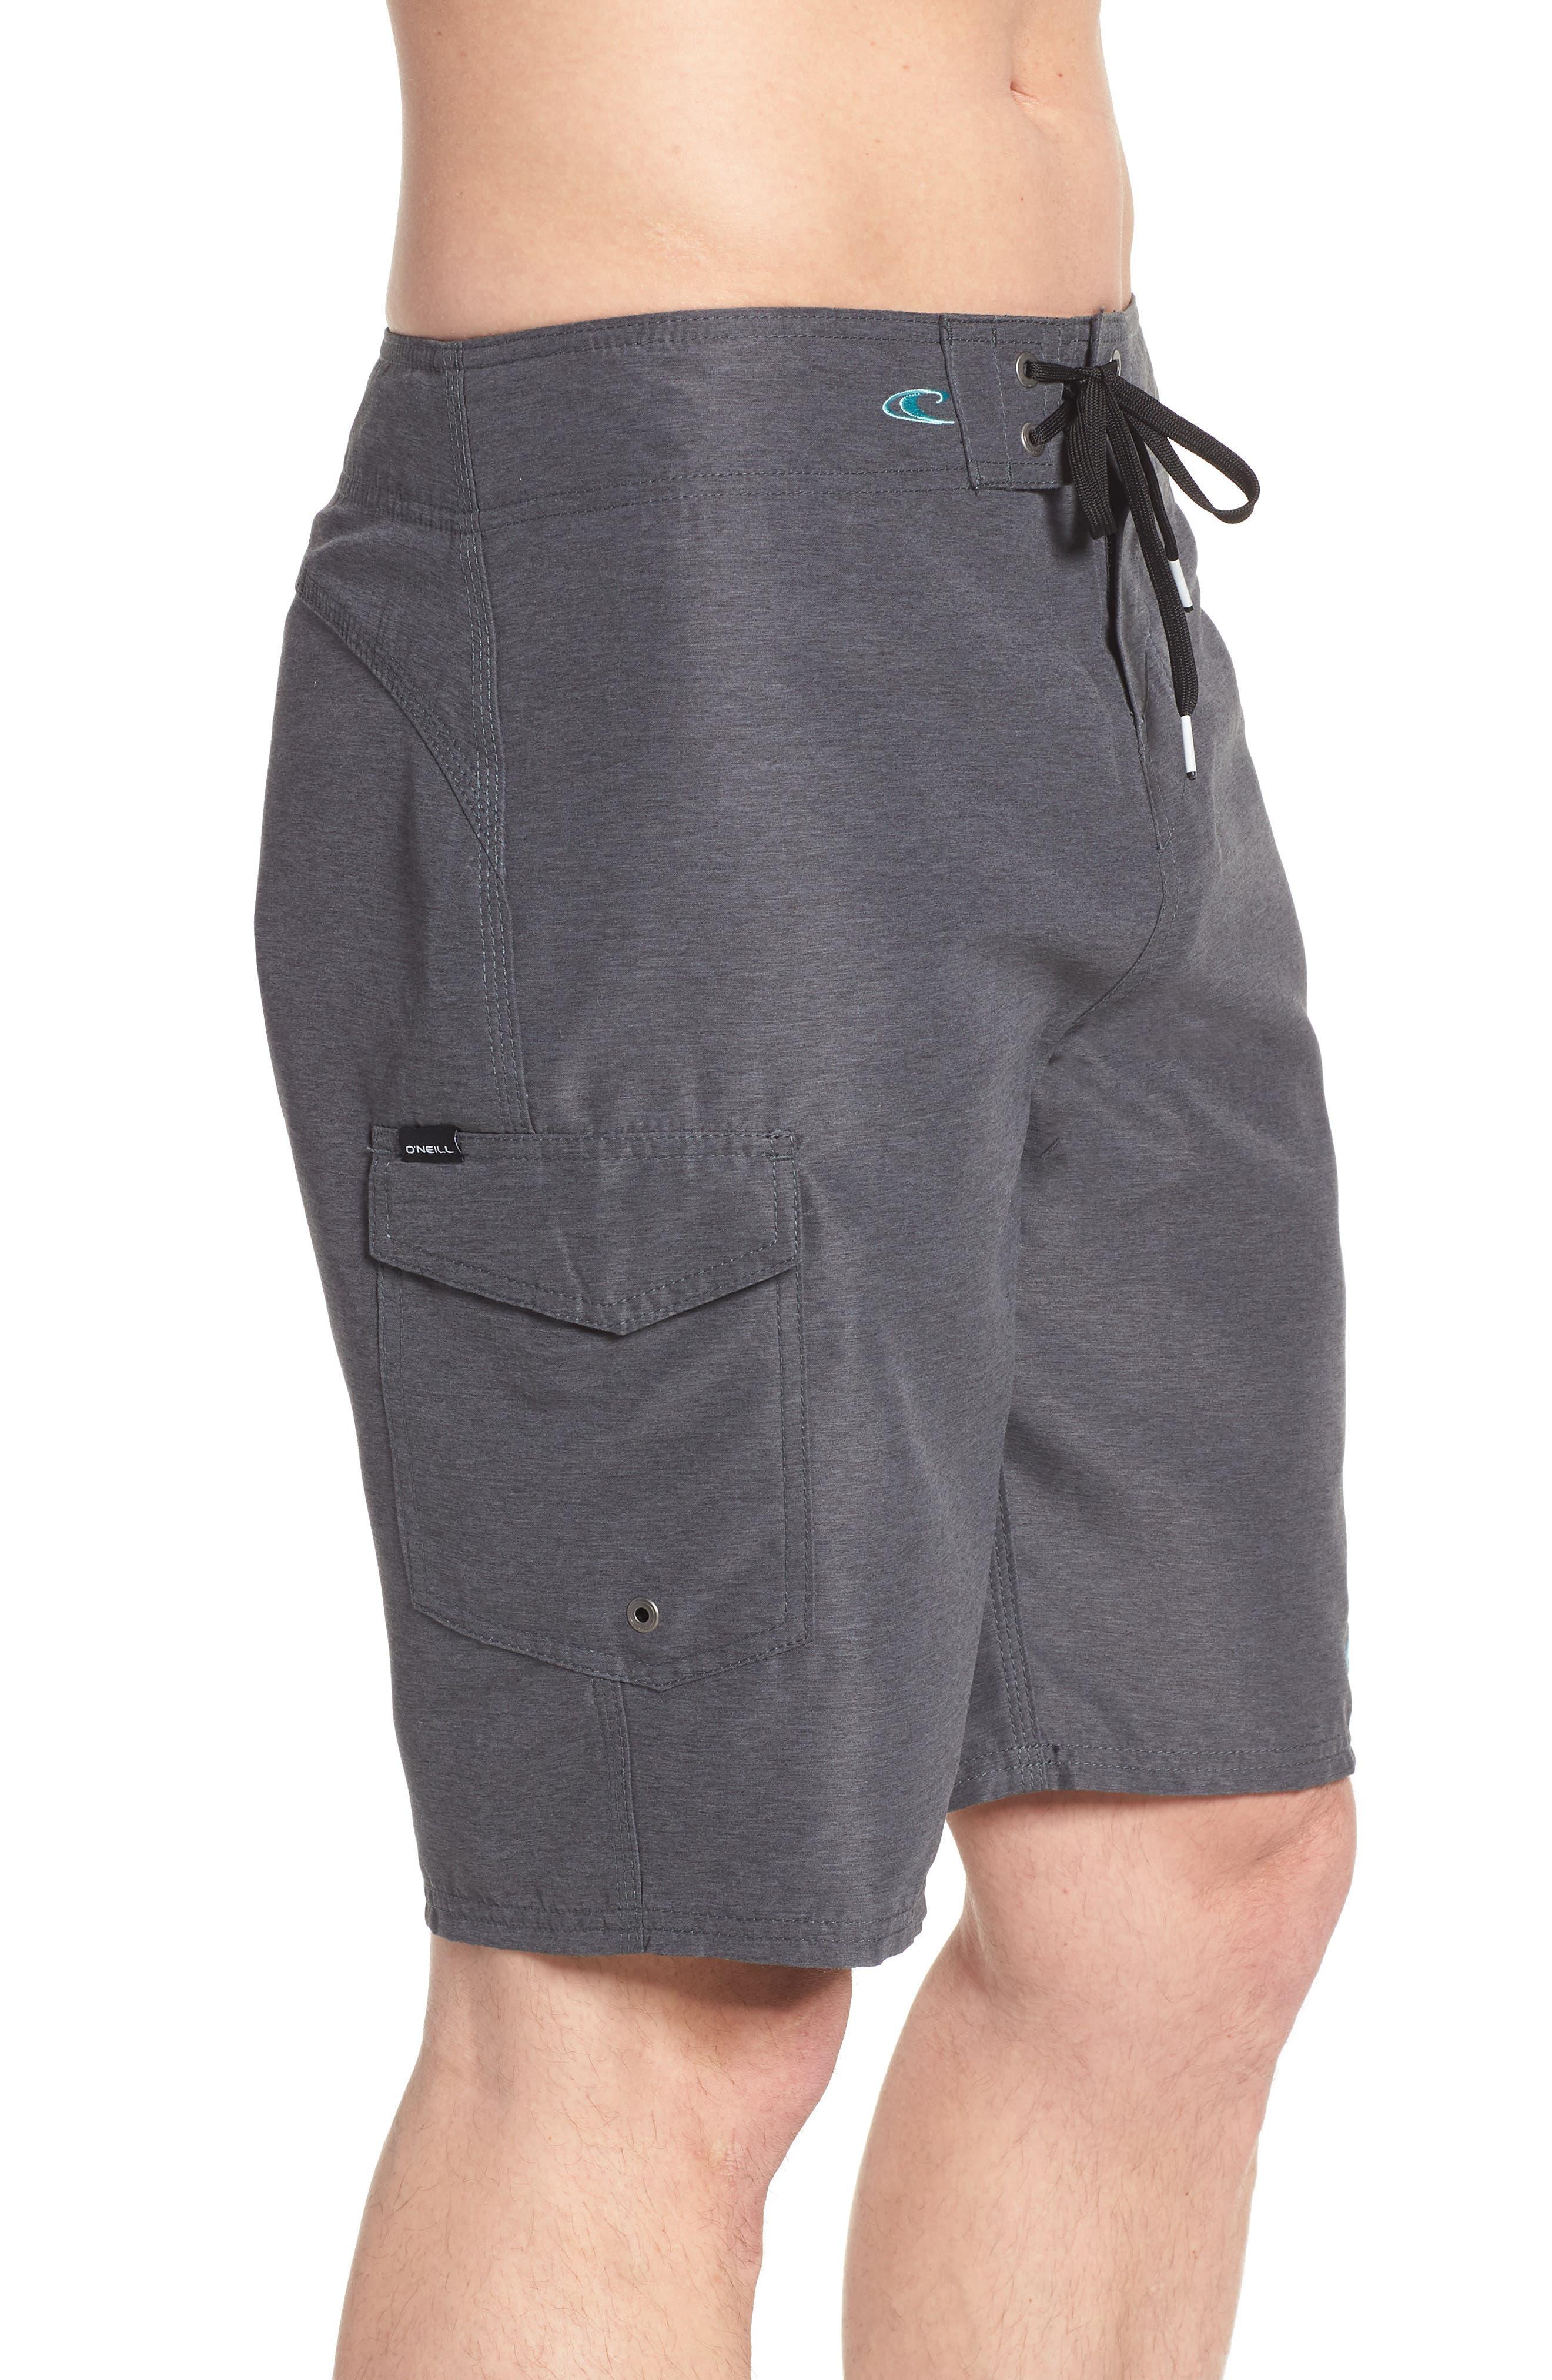 Santa Cruz Board Shorts,                             Alternate thumbnail 3, color,                             001